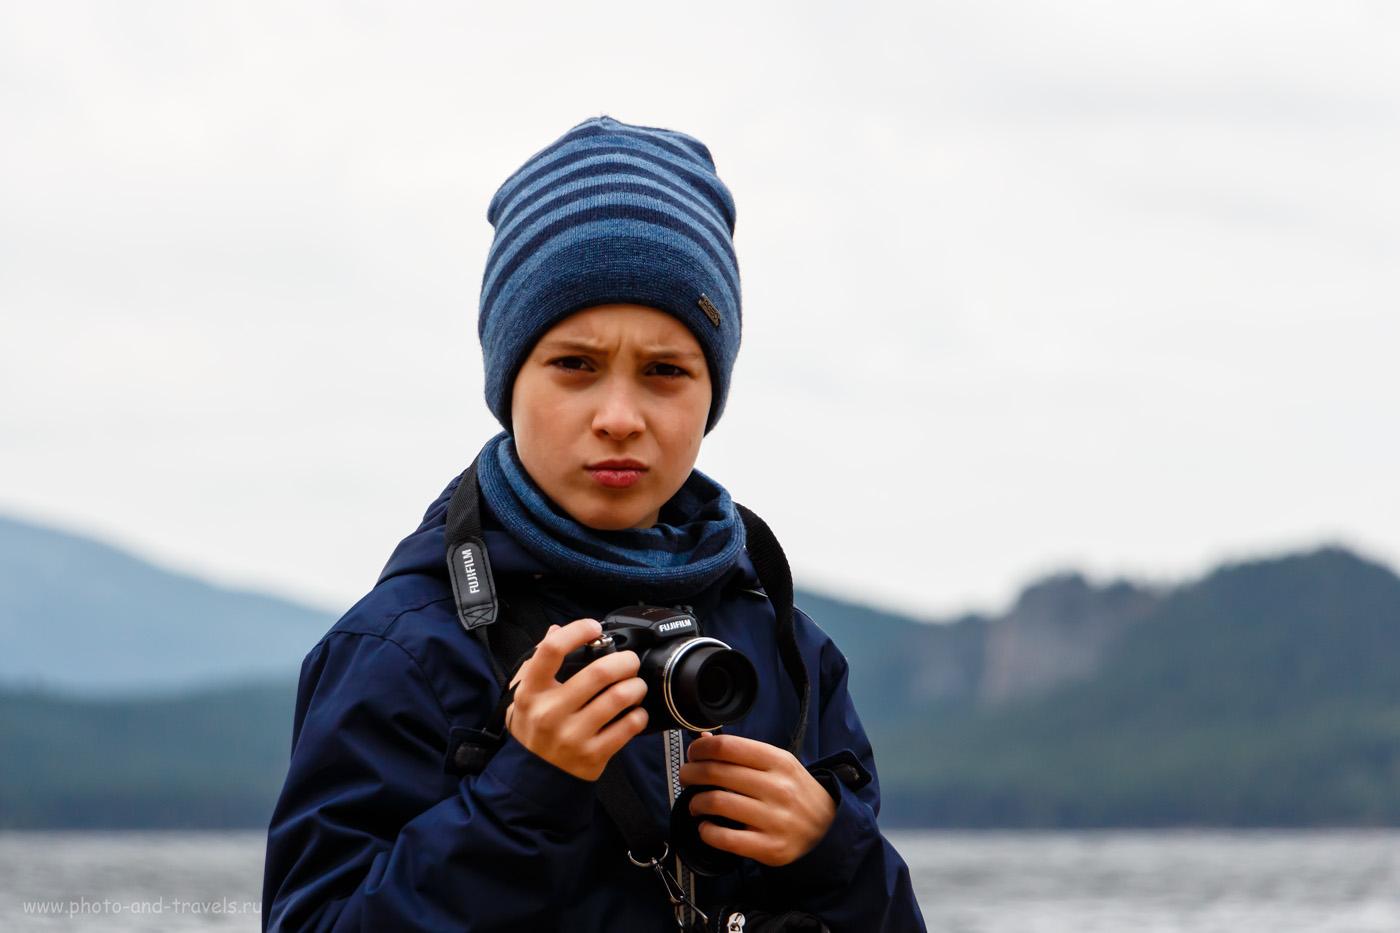 Фото 39. Начинающий фотограф на отдыхе в Казахстане. Прогулка по осеннему Бурабаю. 1/1000, +0.3, 5.6, 400, 135.